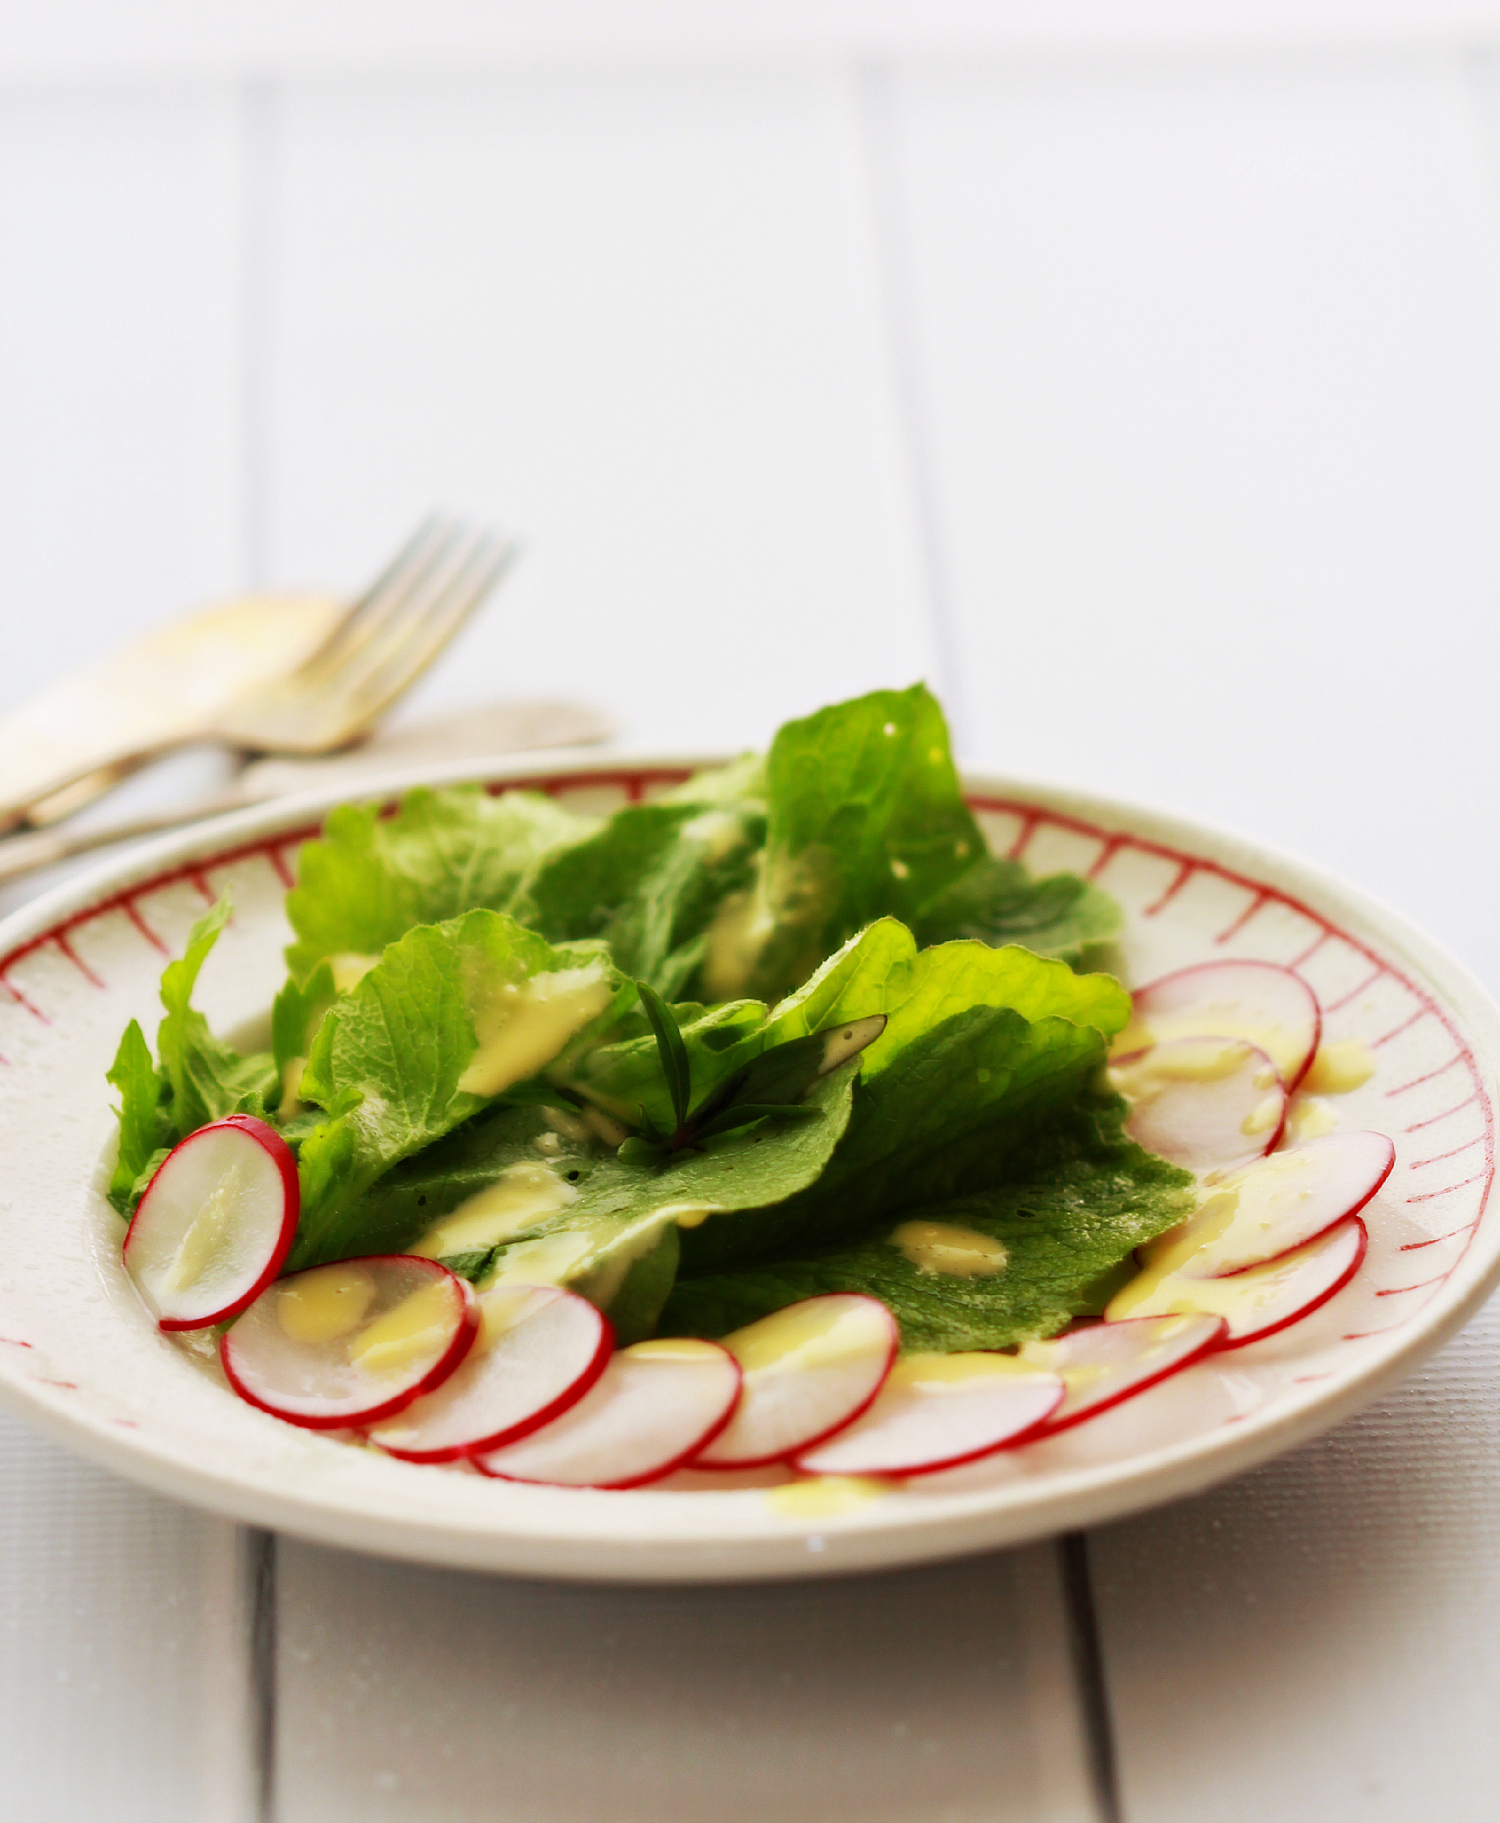 Radish Salad by Dena T Bray